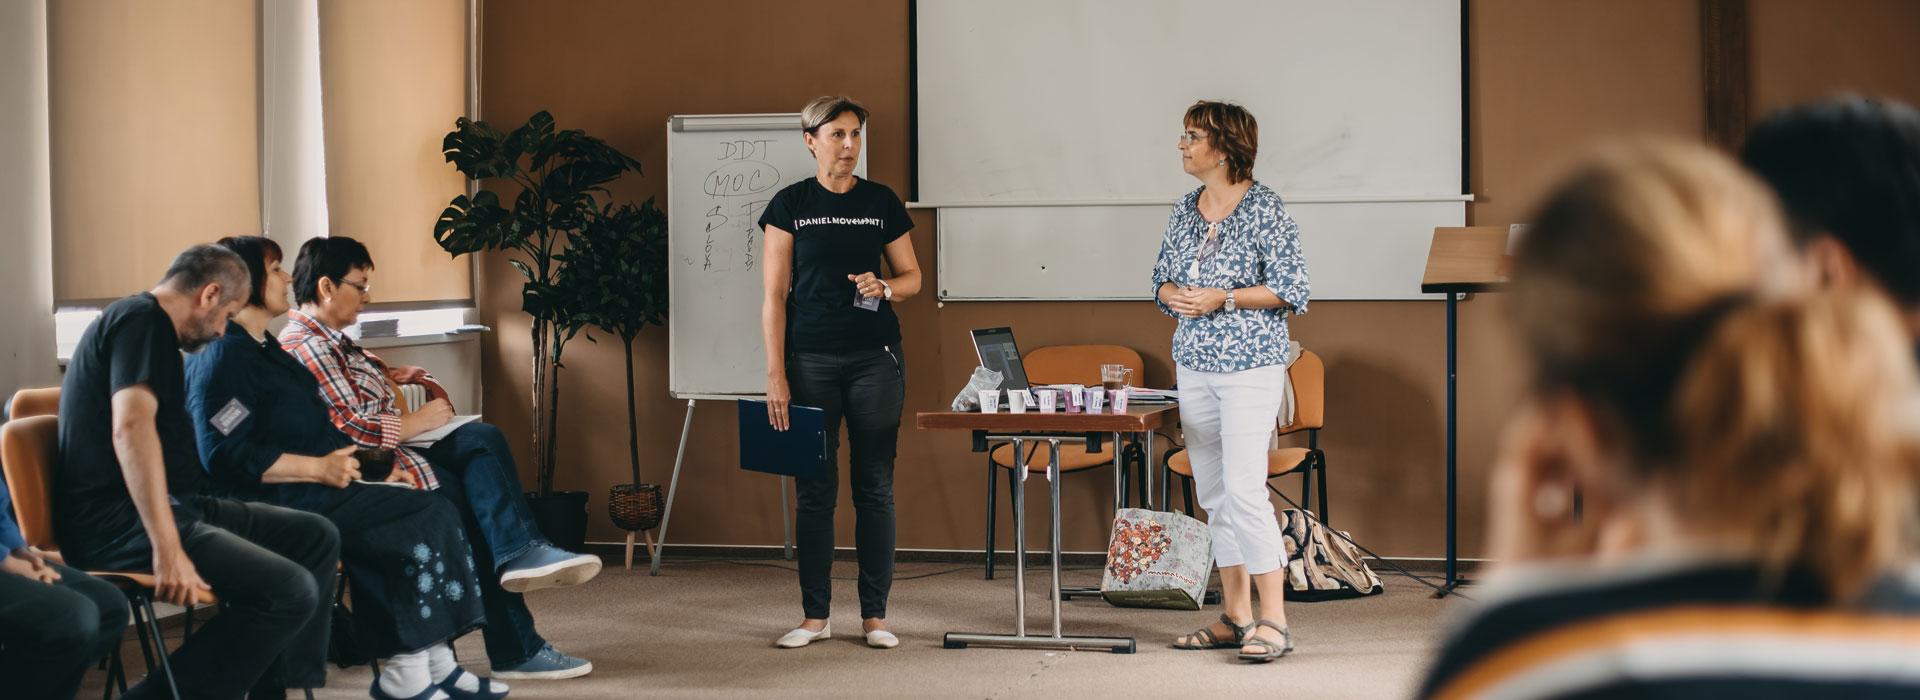 20190911_10-51-53_lektorska.konference_sara.zedkova-RHmod1